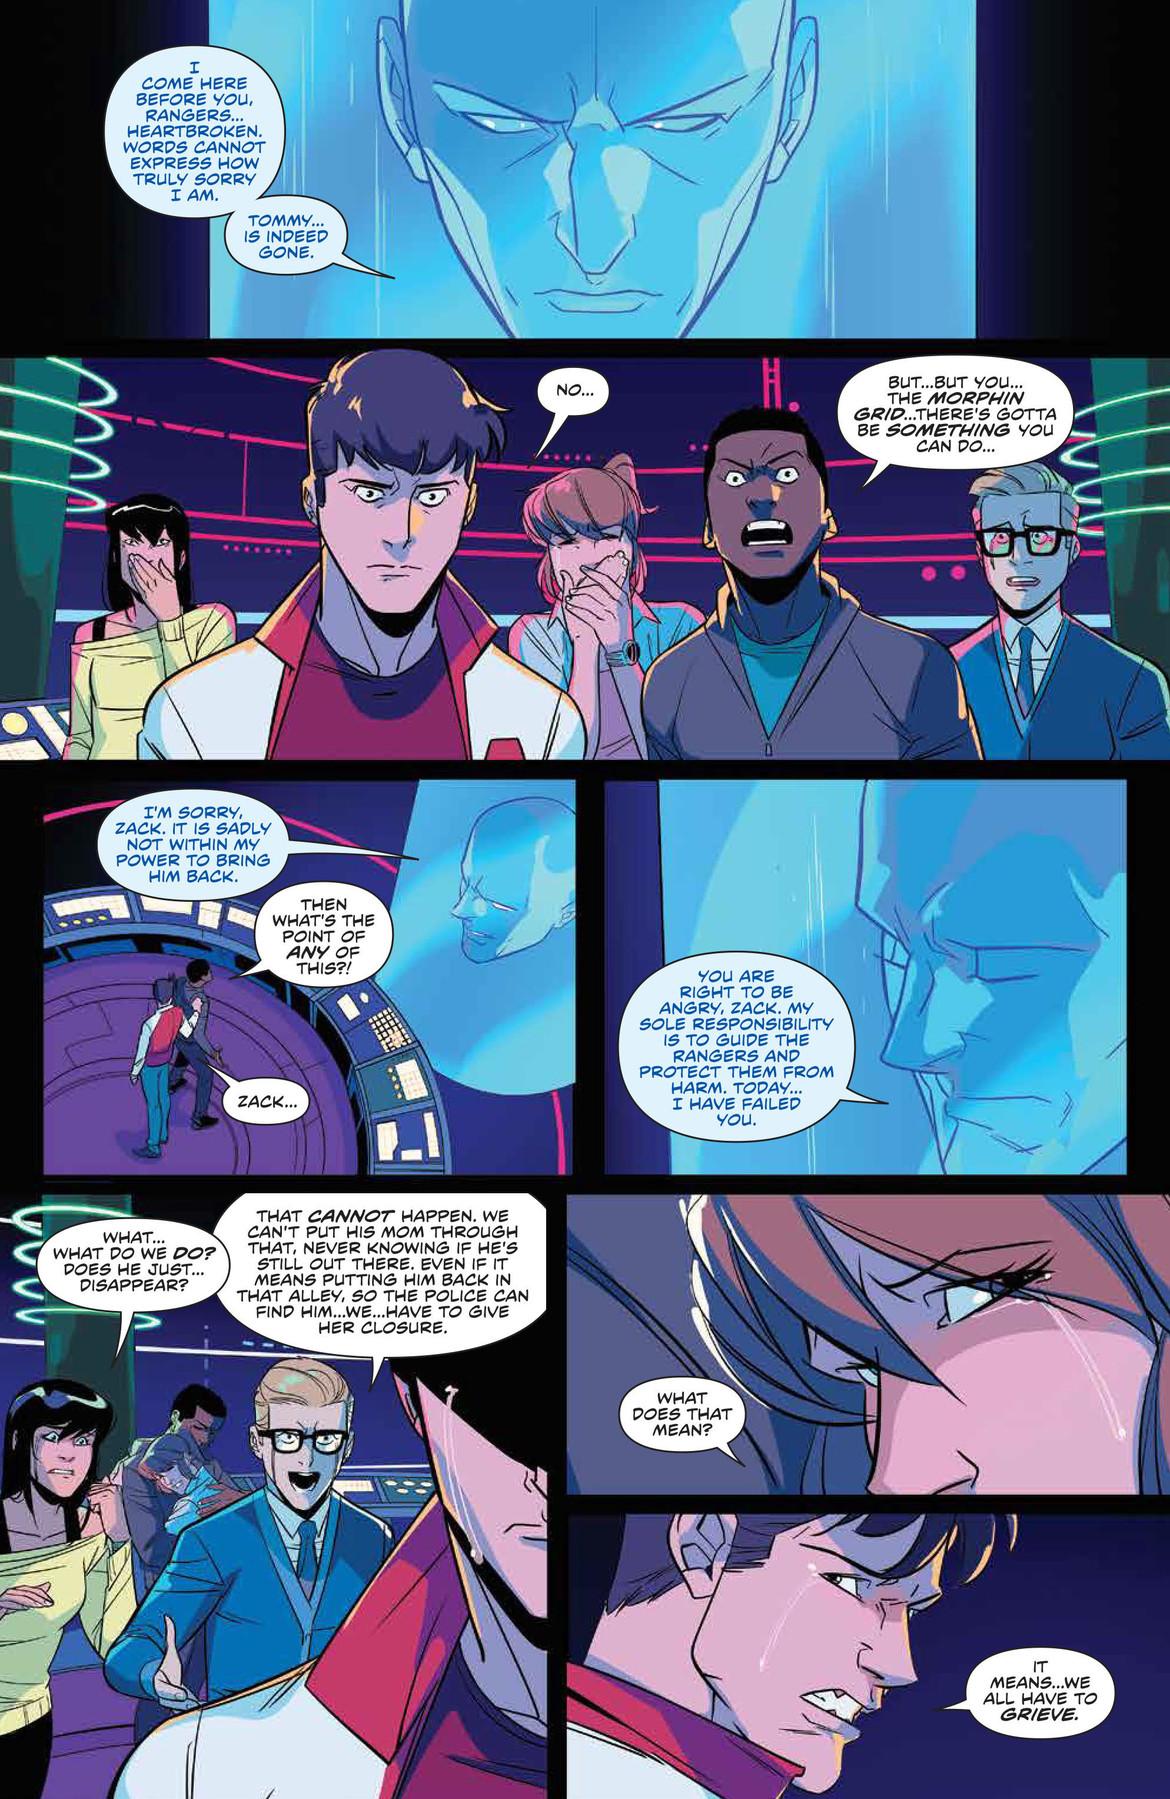 Power Rangers talk to Zordon